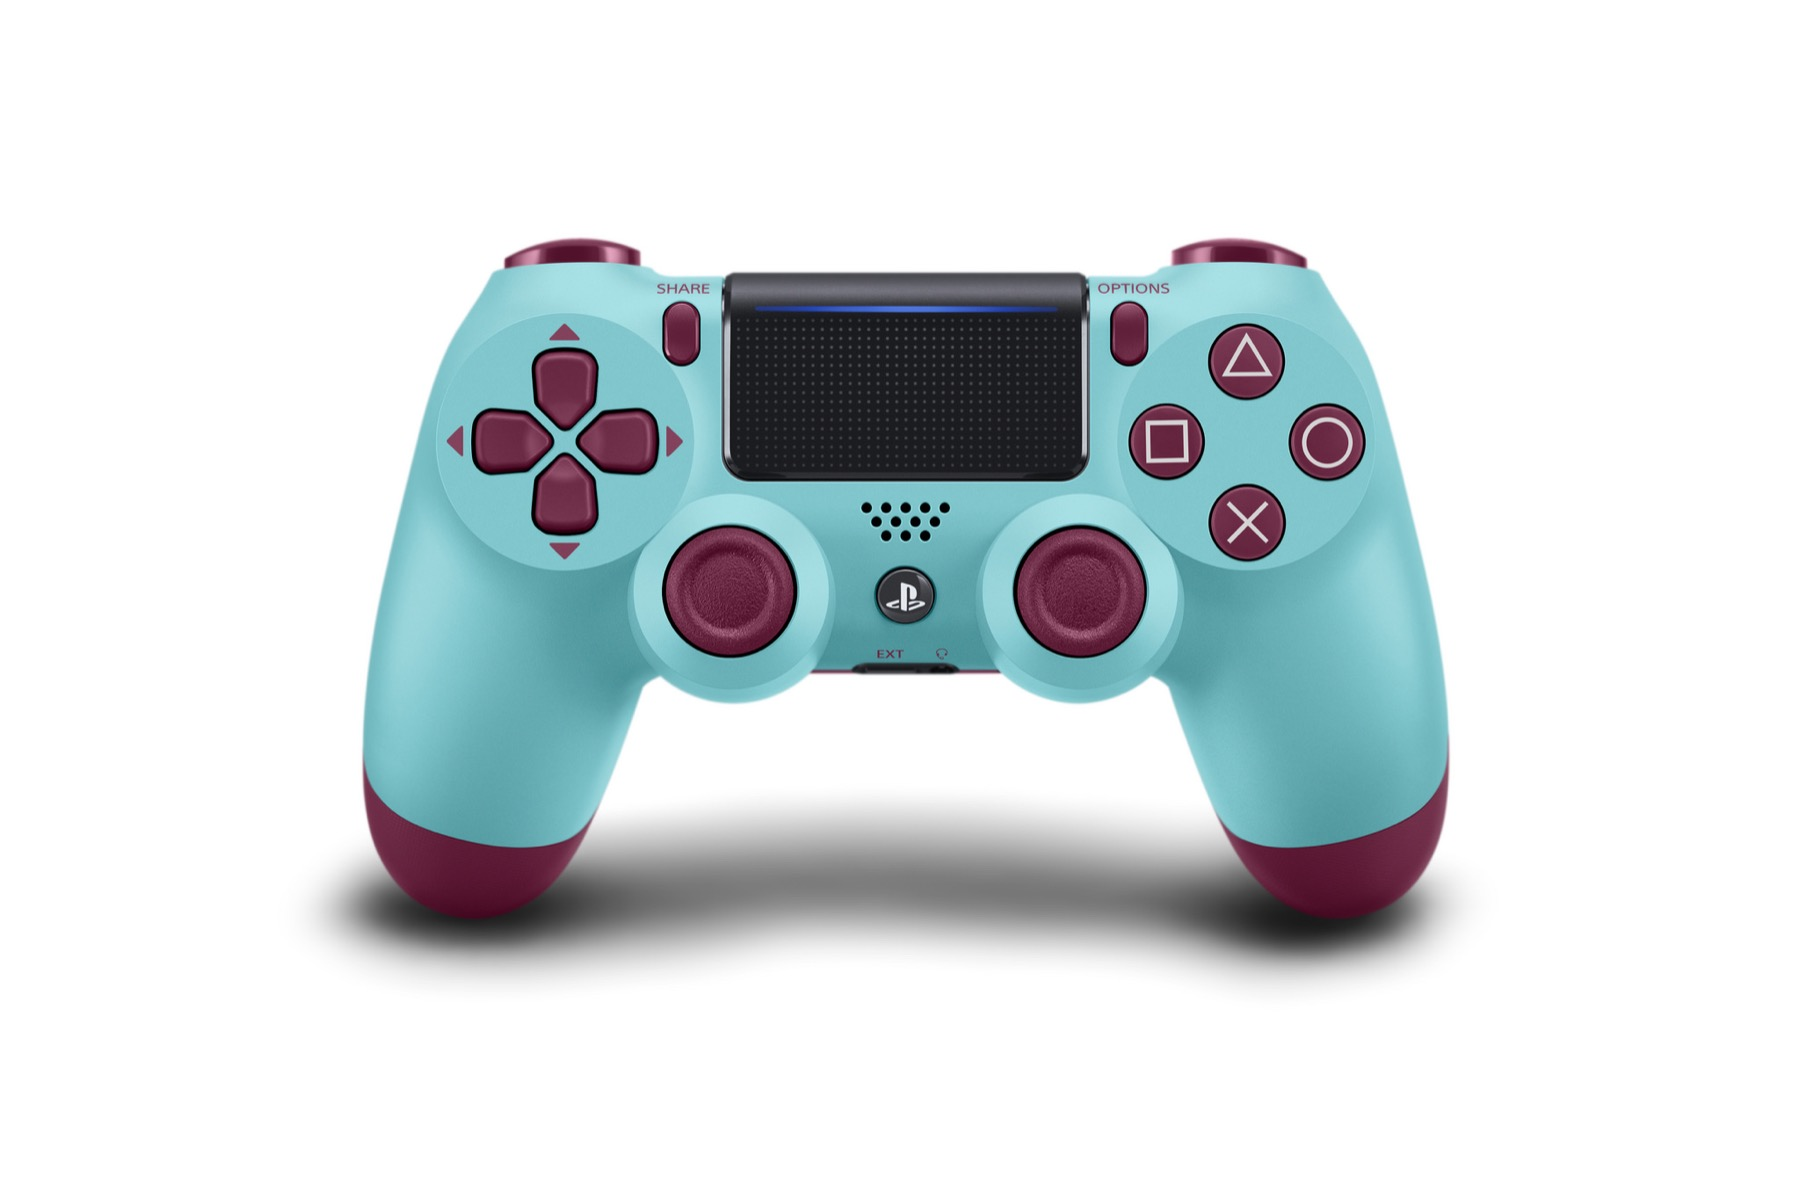 Ps4 Controller Farben.Dualshock 4 Drei Neue Farben Für Den Ps4 Controller